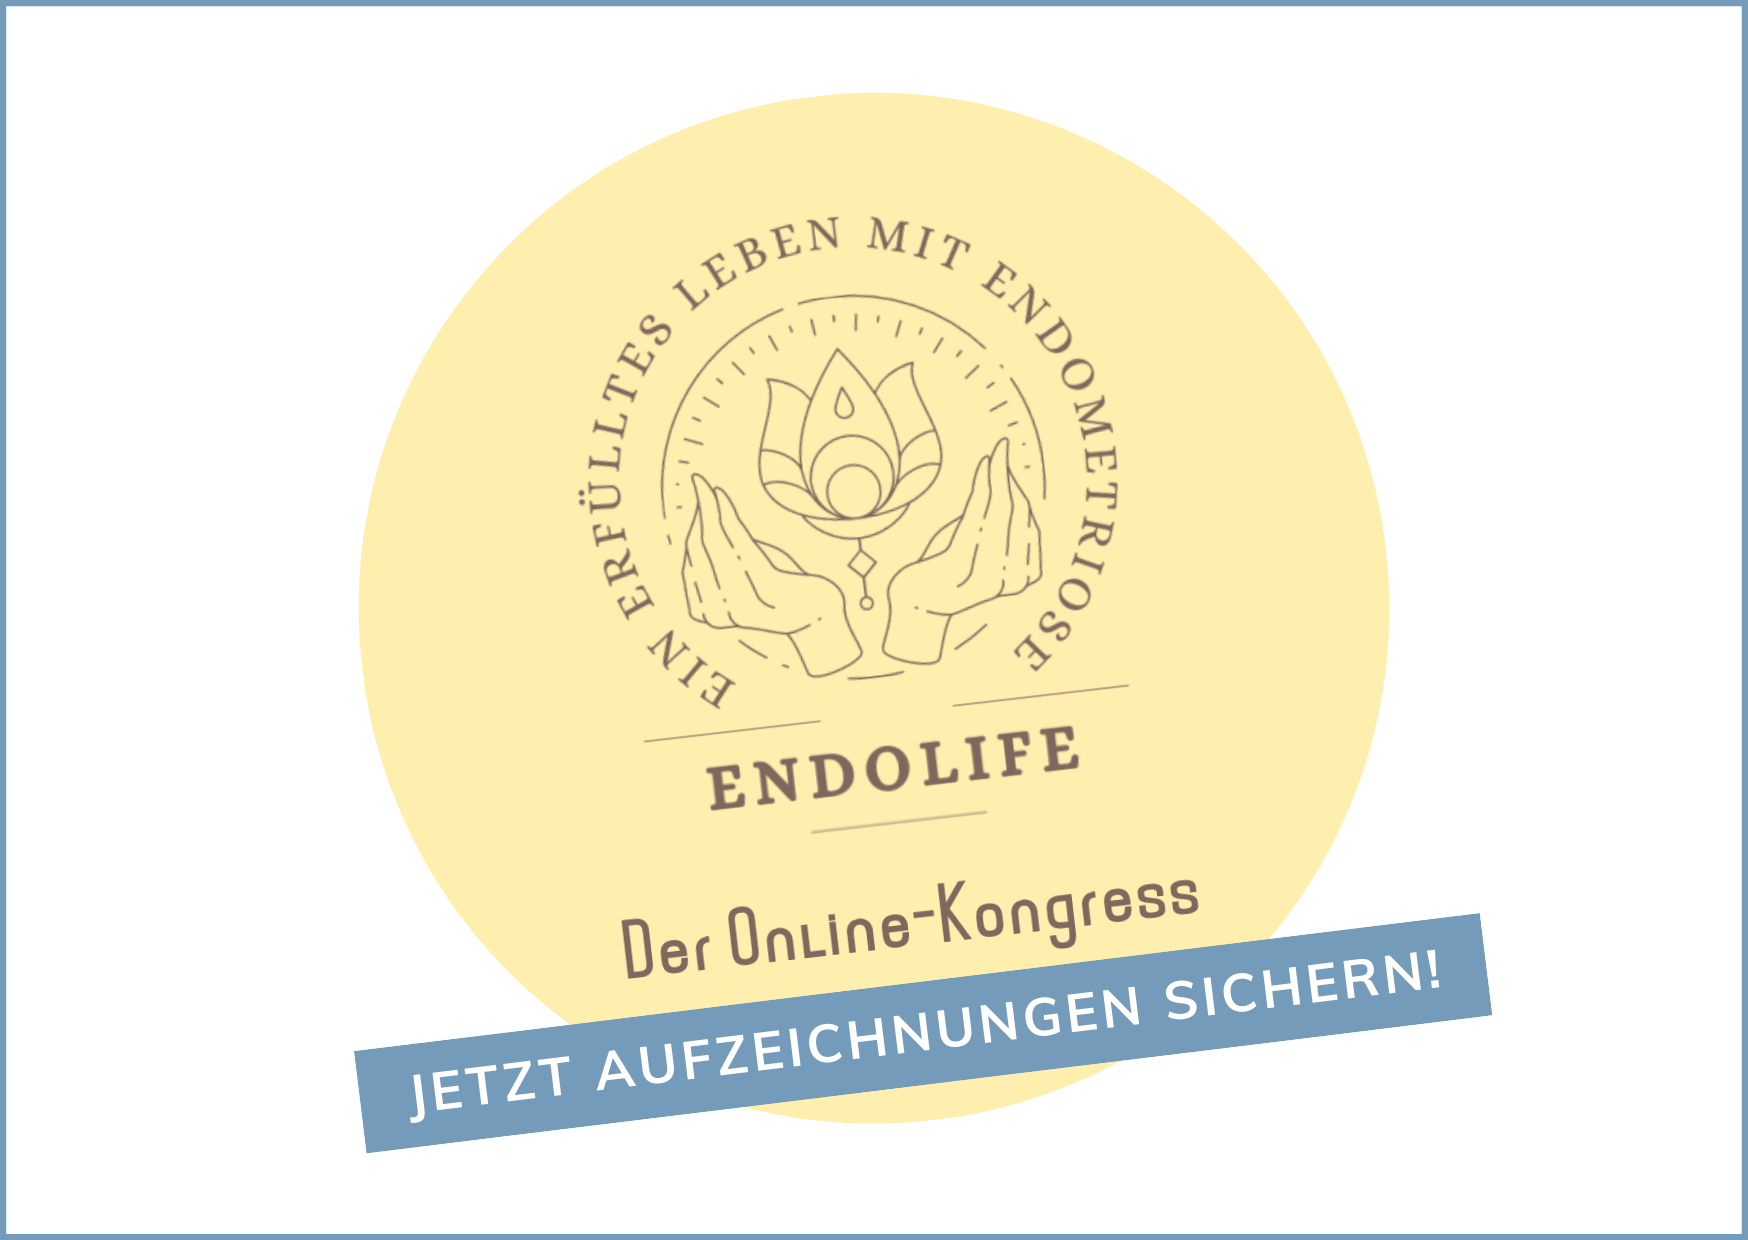 Rita Hofmeister Endolife Endometriose KOngress Aufzeichnungen Bonusmaterial